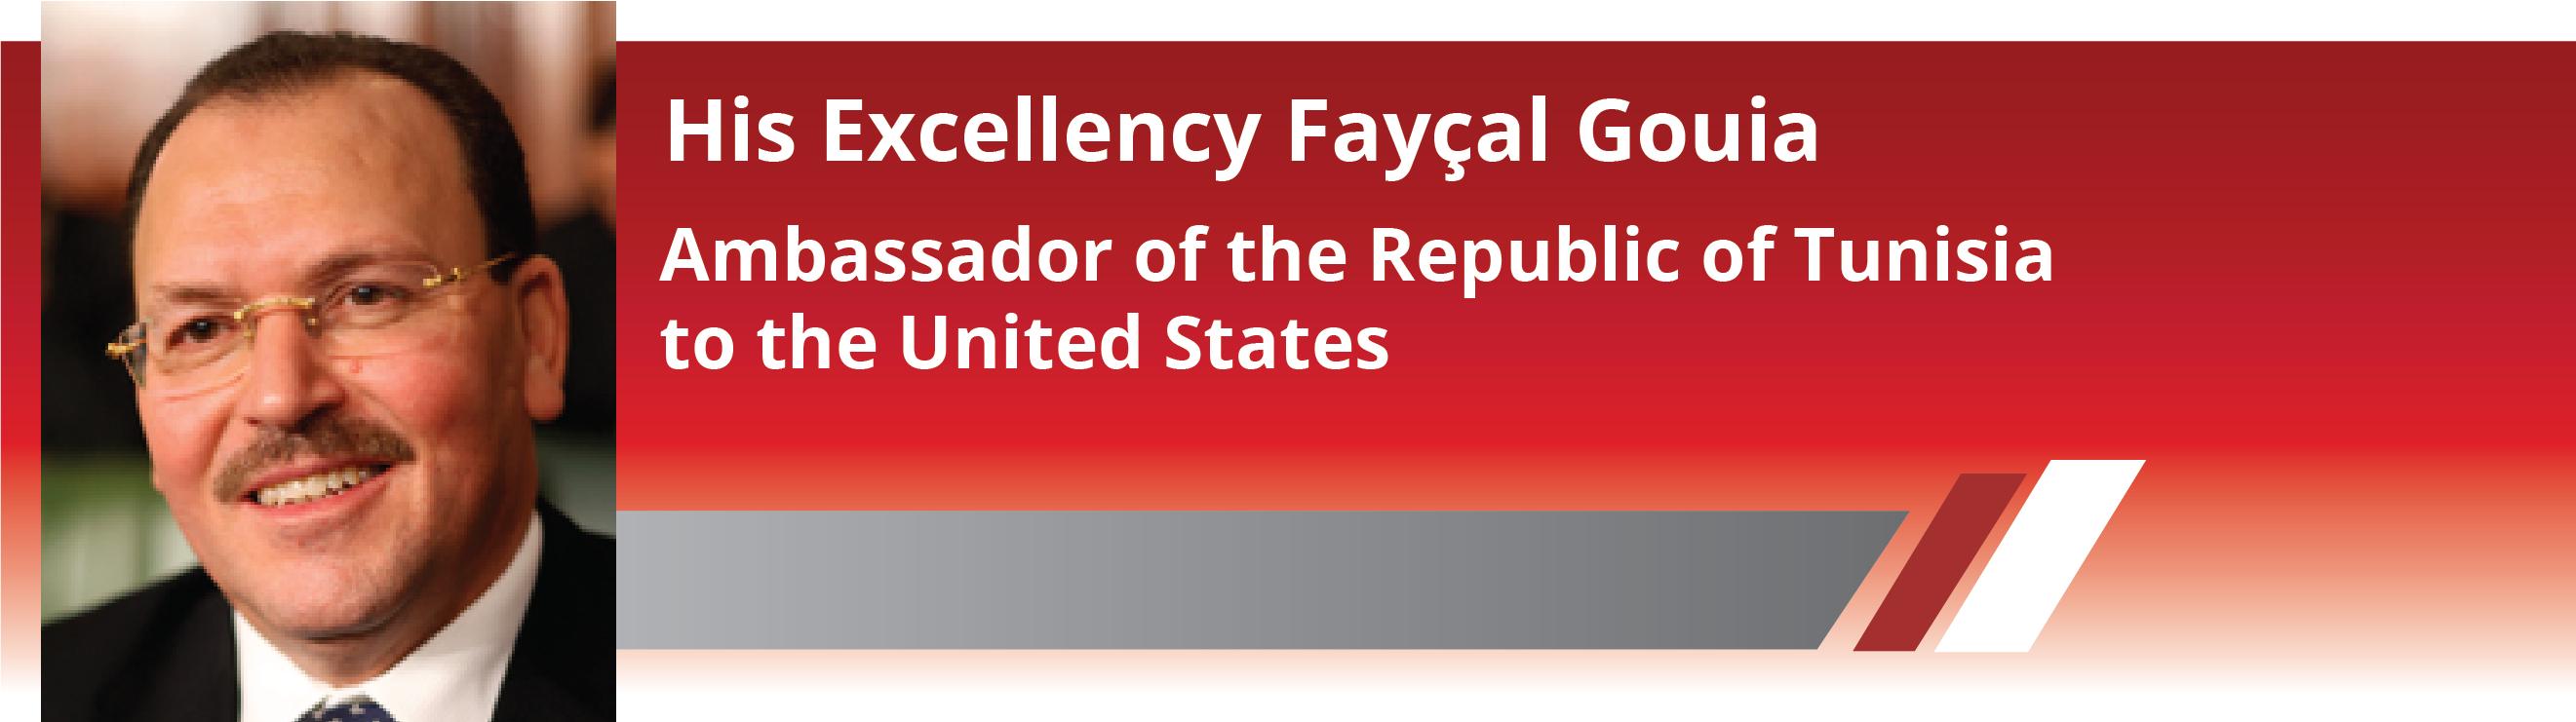 TTU faycal ambassador-01